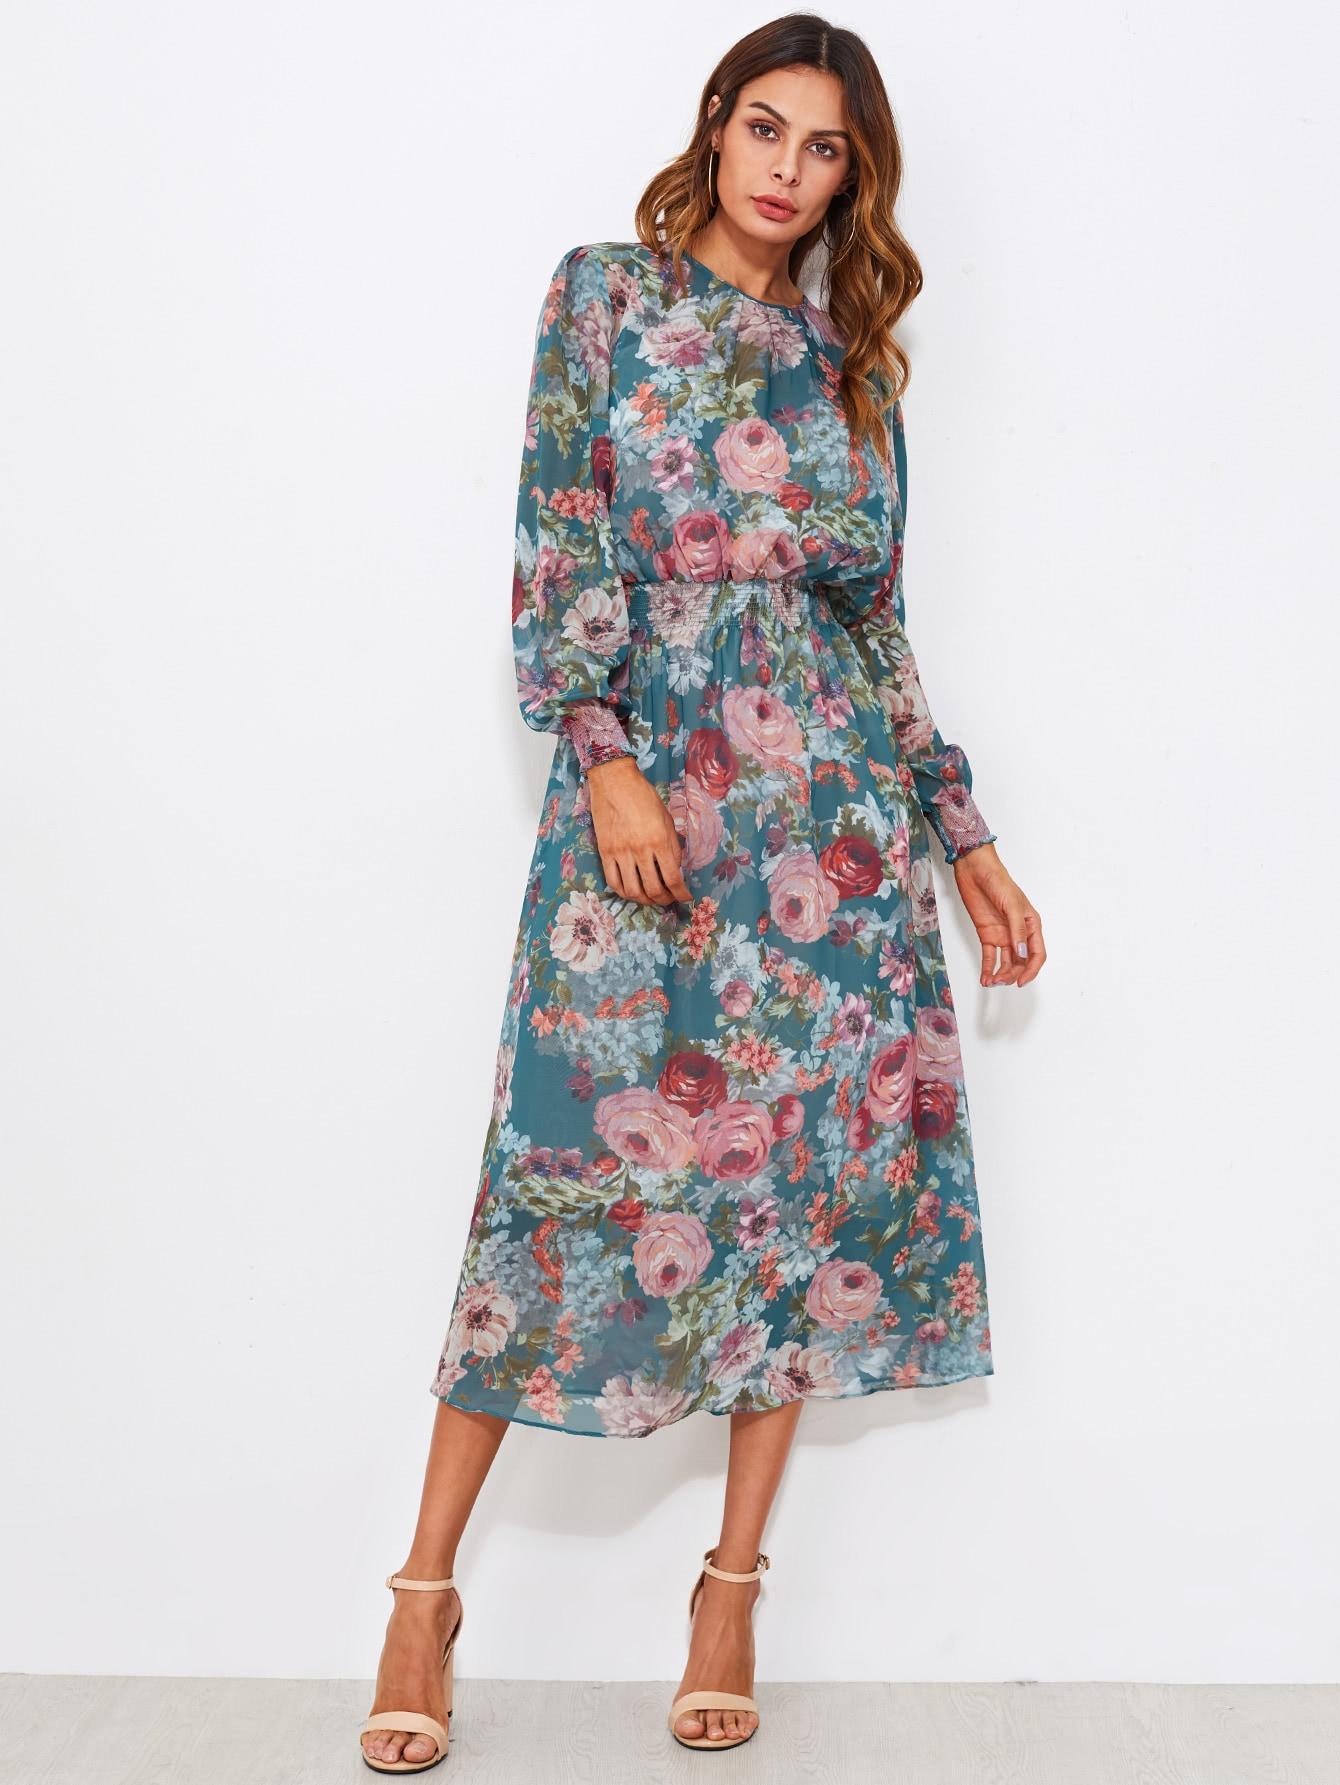 Shirred Waist Dress With Liner Slip Dress